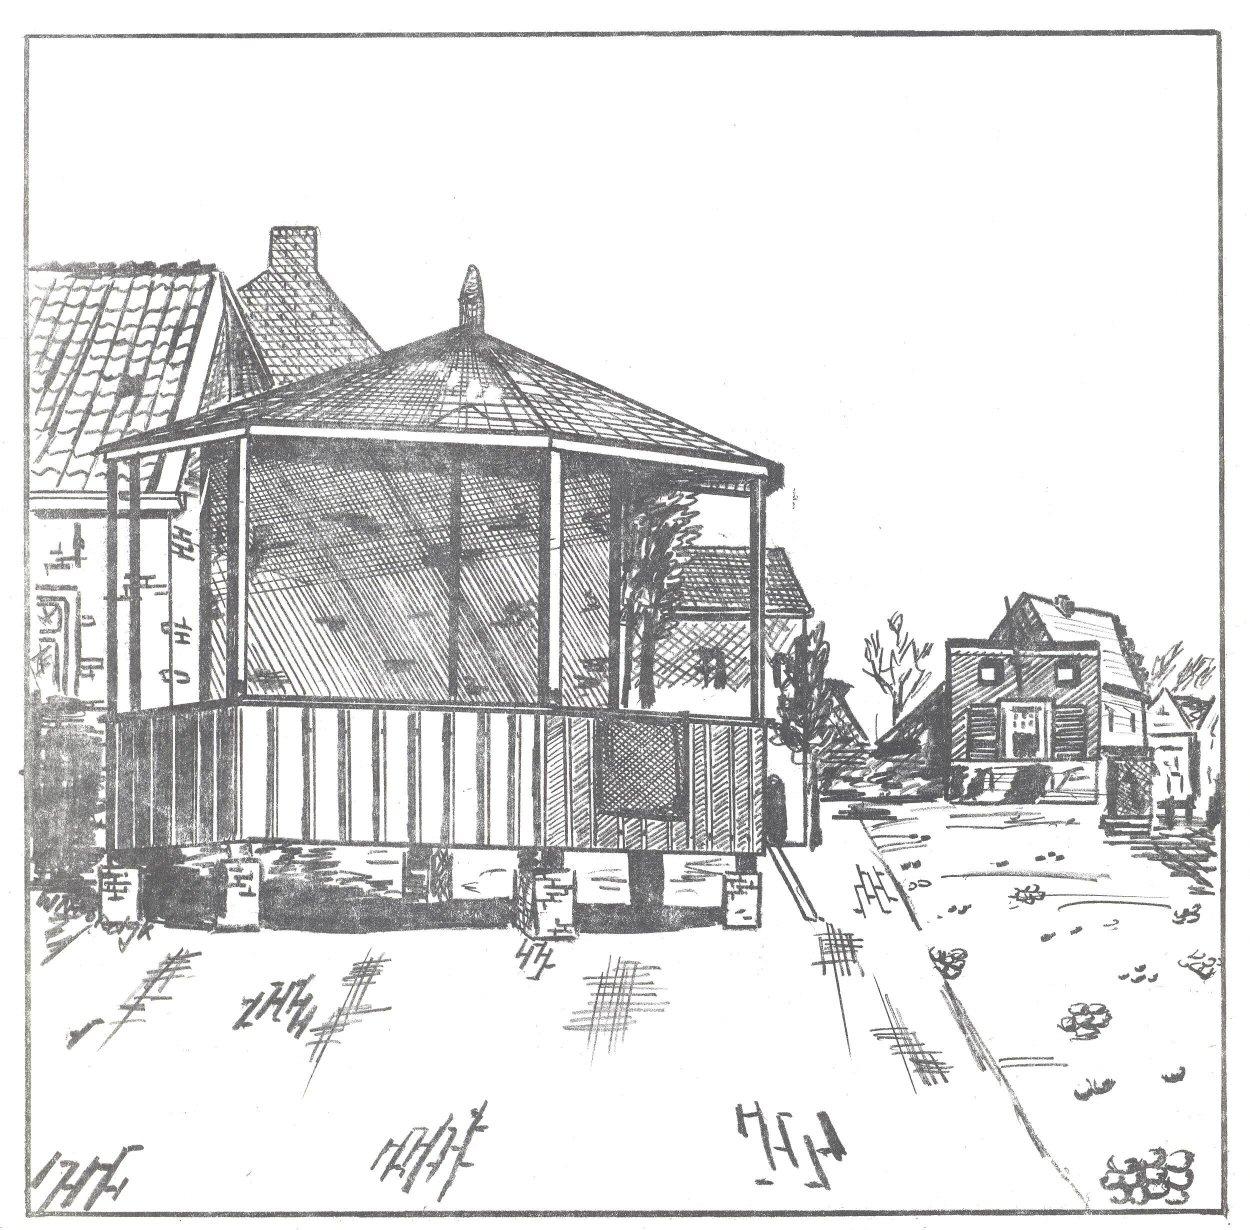 KALE-005e Kalender 1978